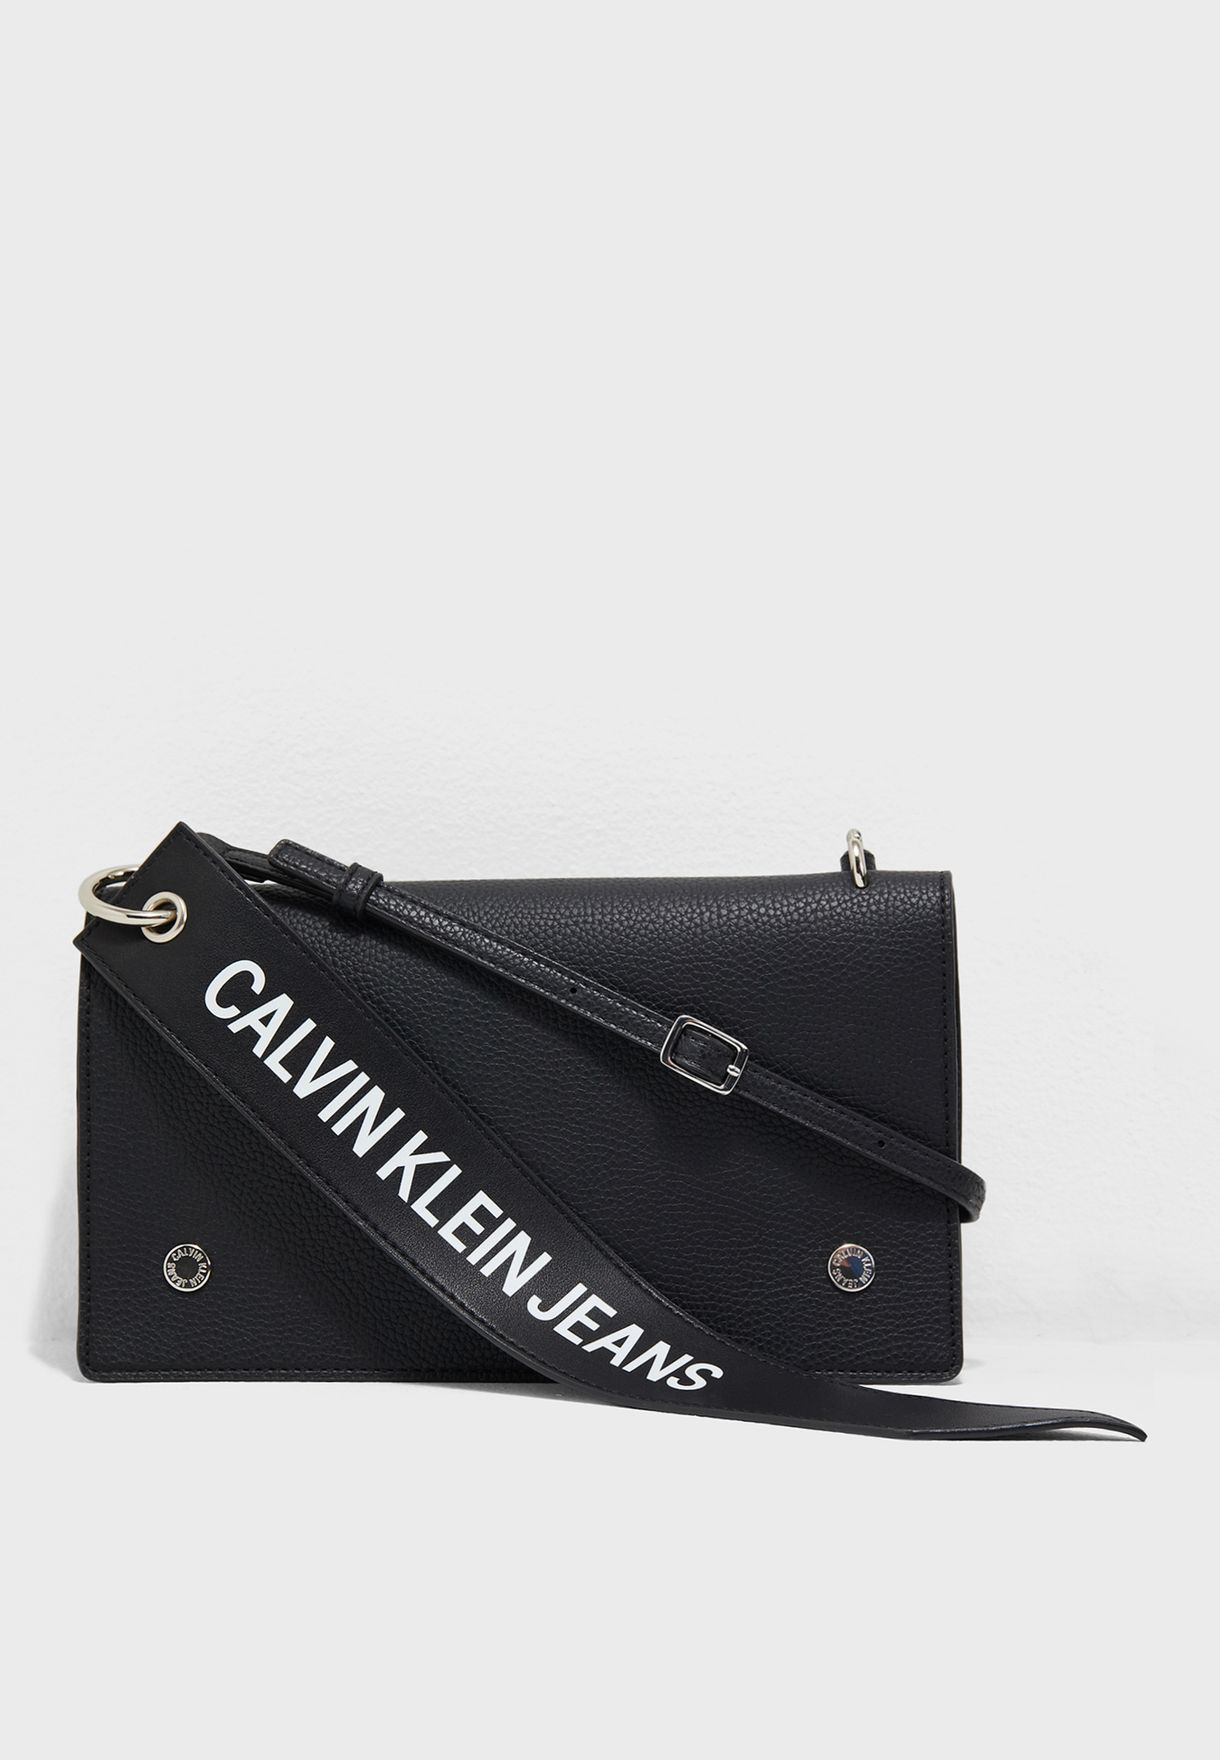 cb671727198 Shop Calvin Klein Jeans black Logo Banner Flap Crossbody K40K400823 ...